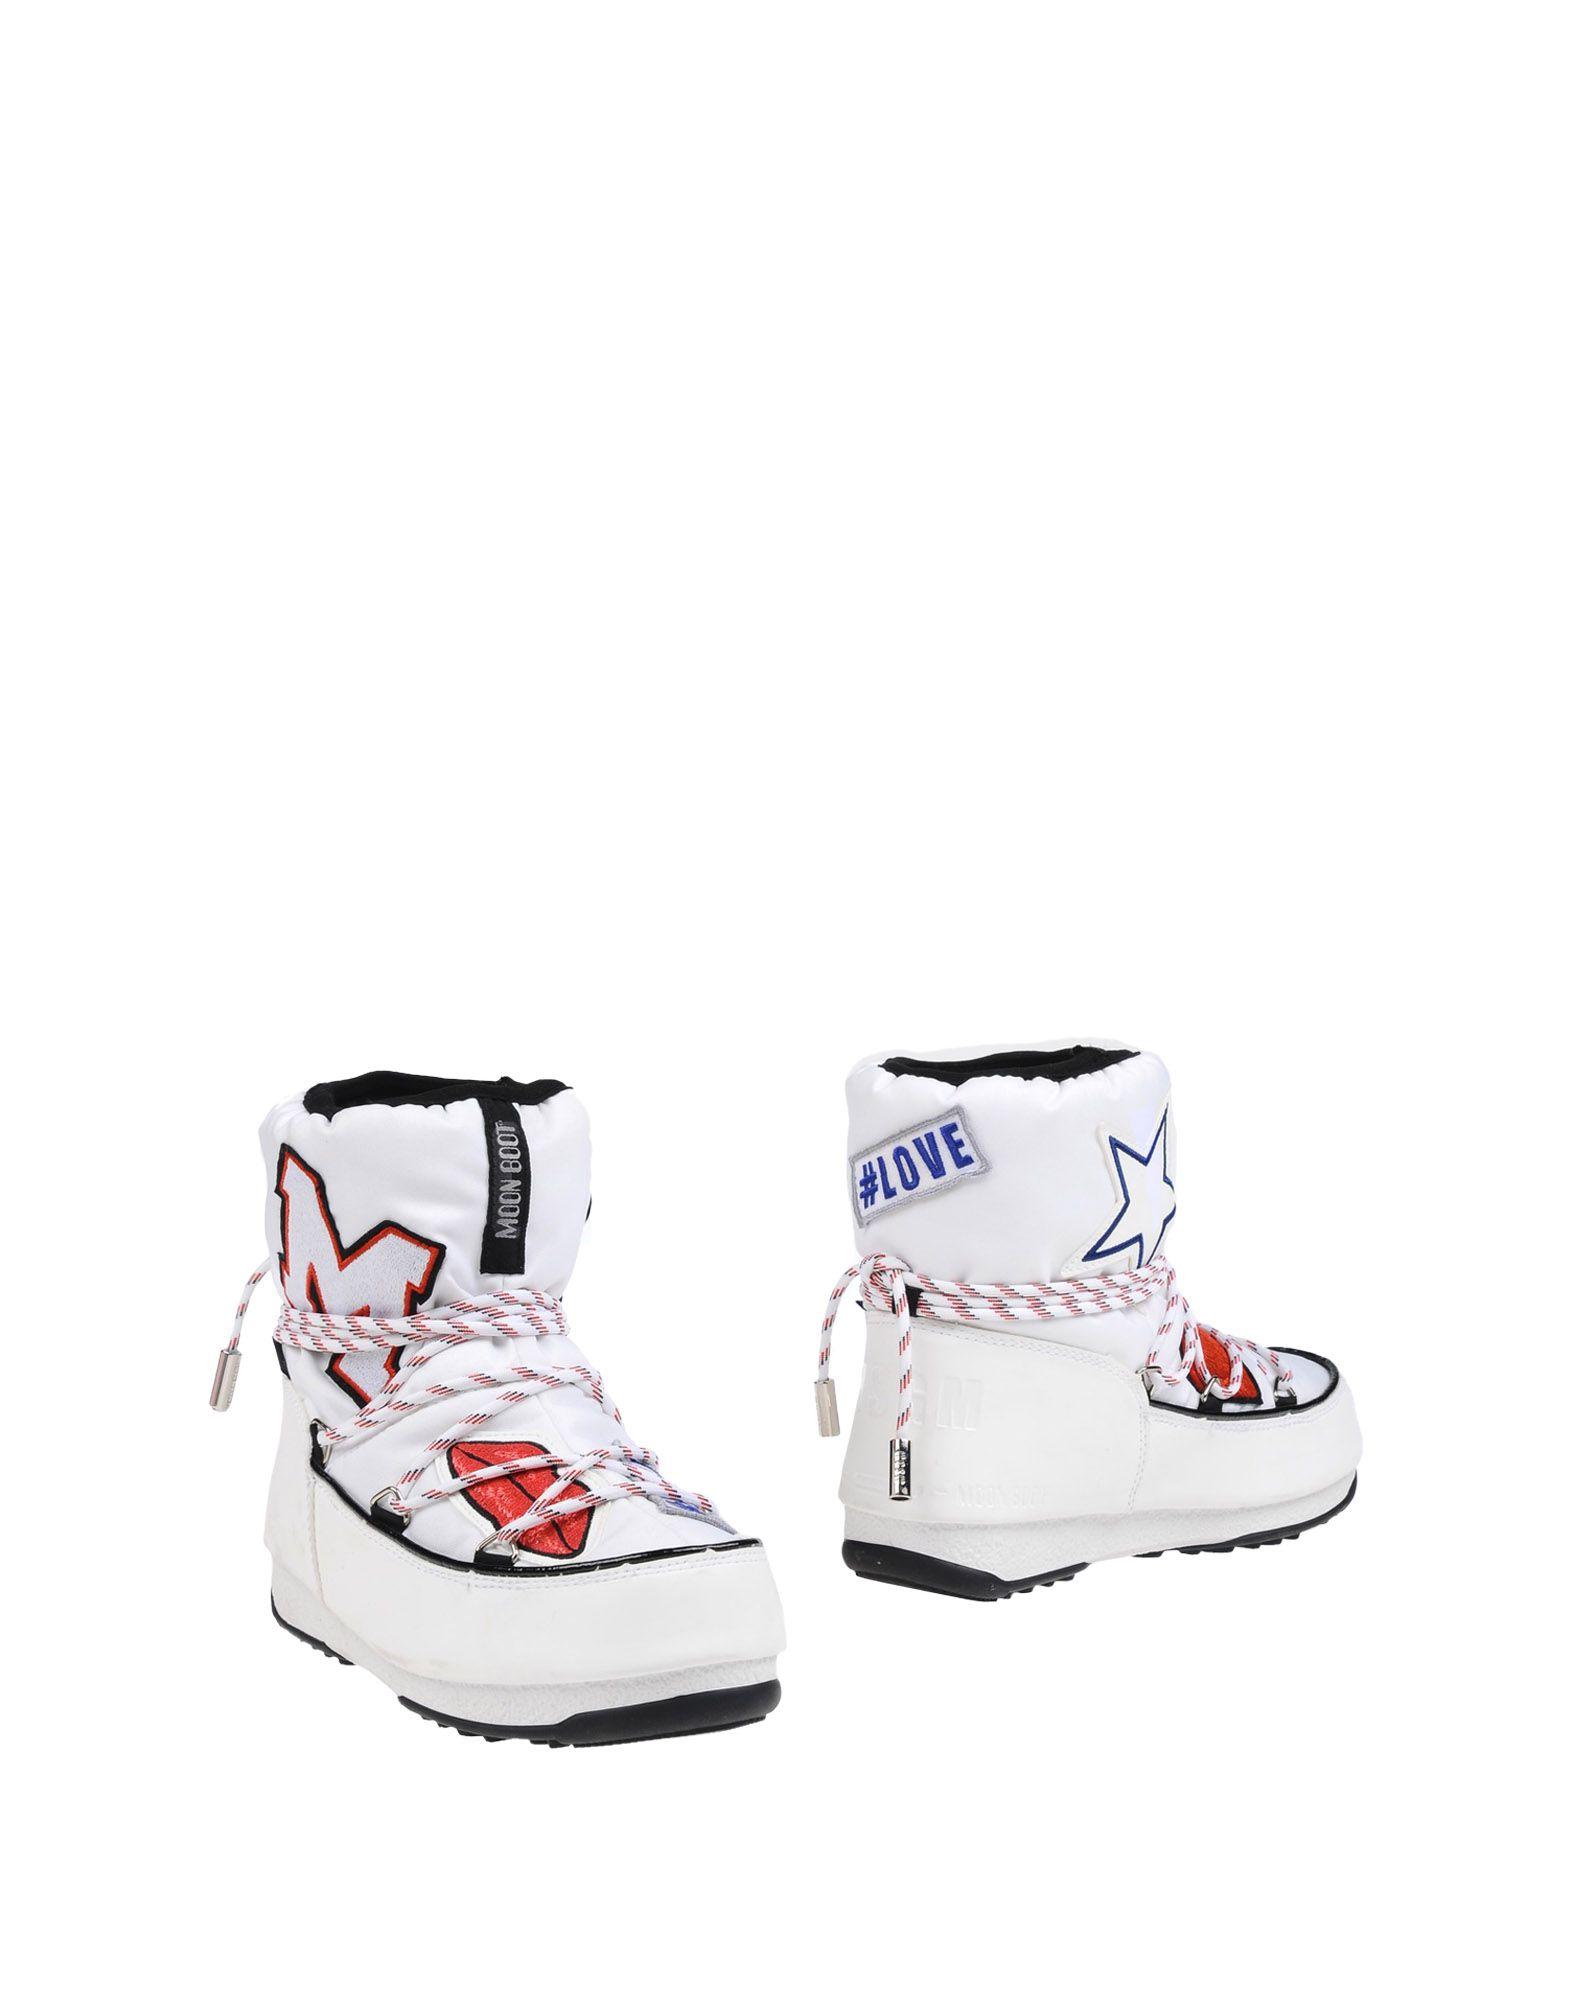 MOON BOOT THE ORIGINAL MSGM Полусапоги и высокие ботинки the christmas boot